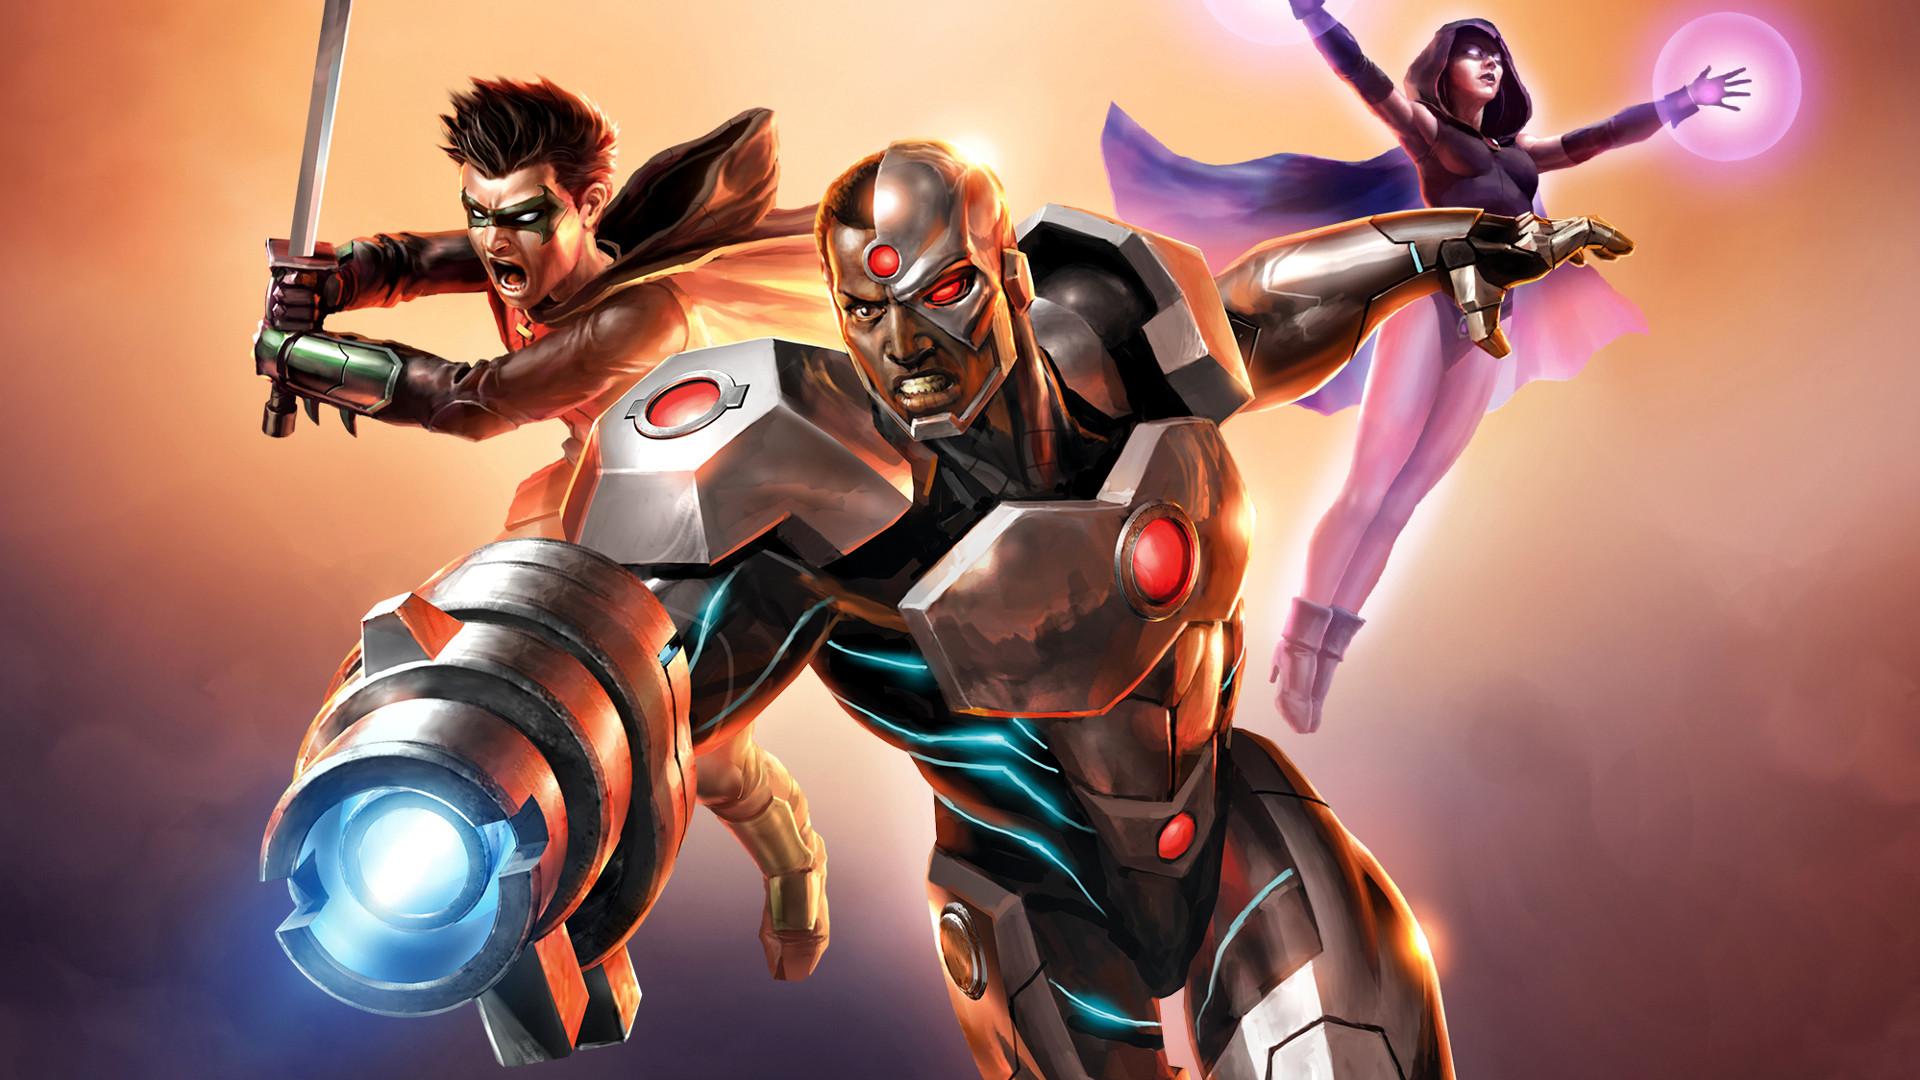 Justice League Vs Teen Titans  Movie Fanart  Fanarttv-8202